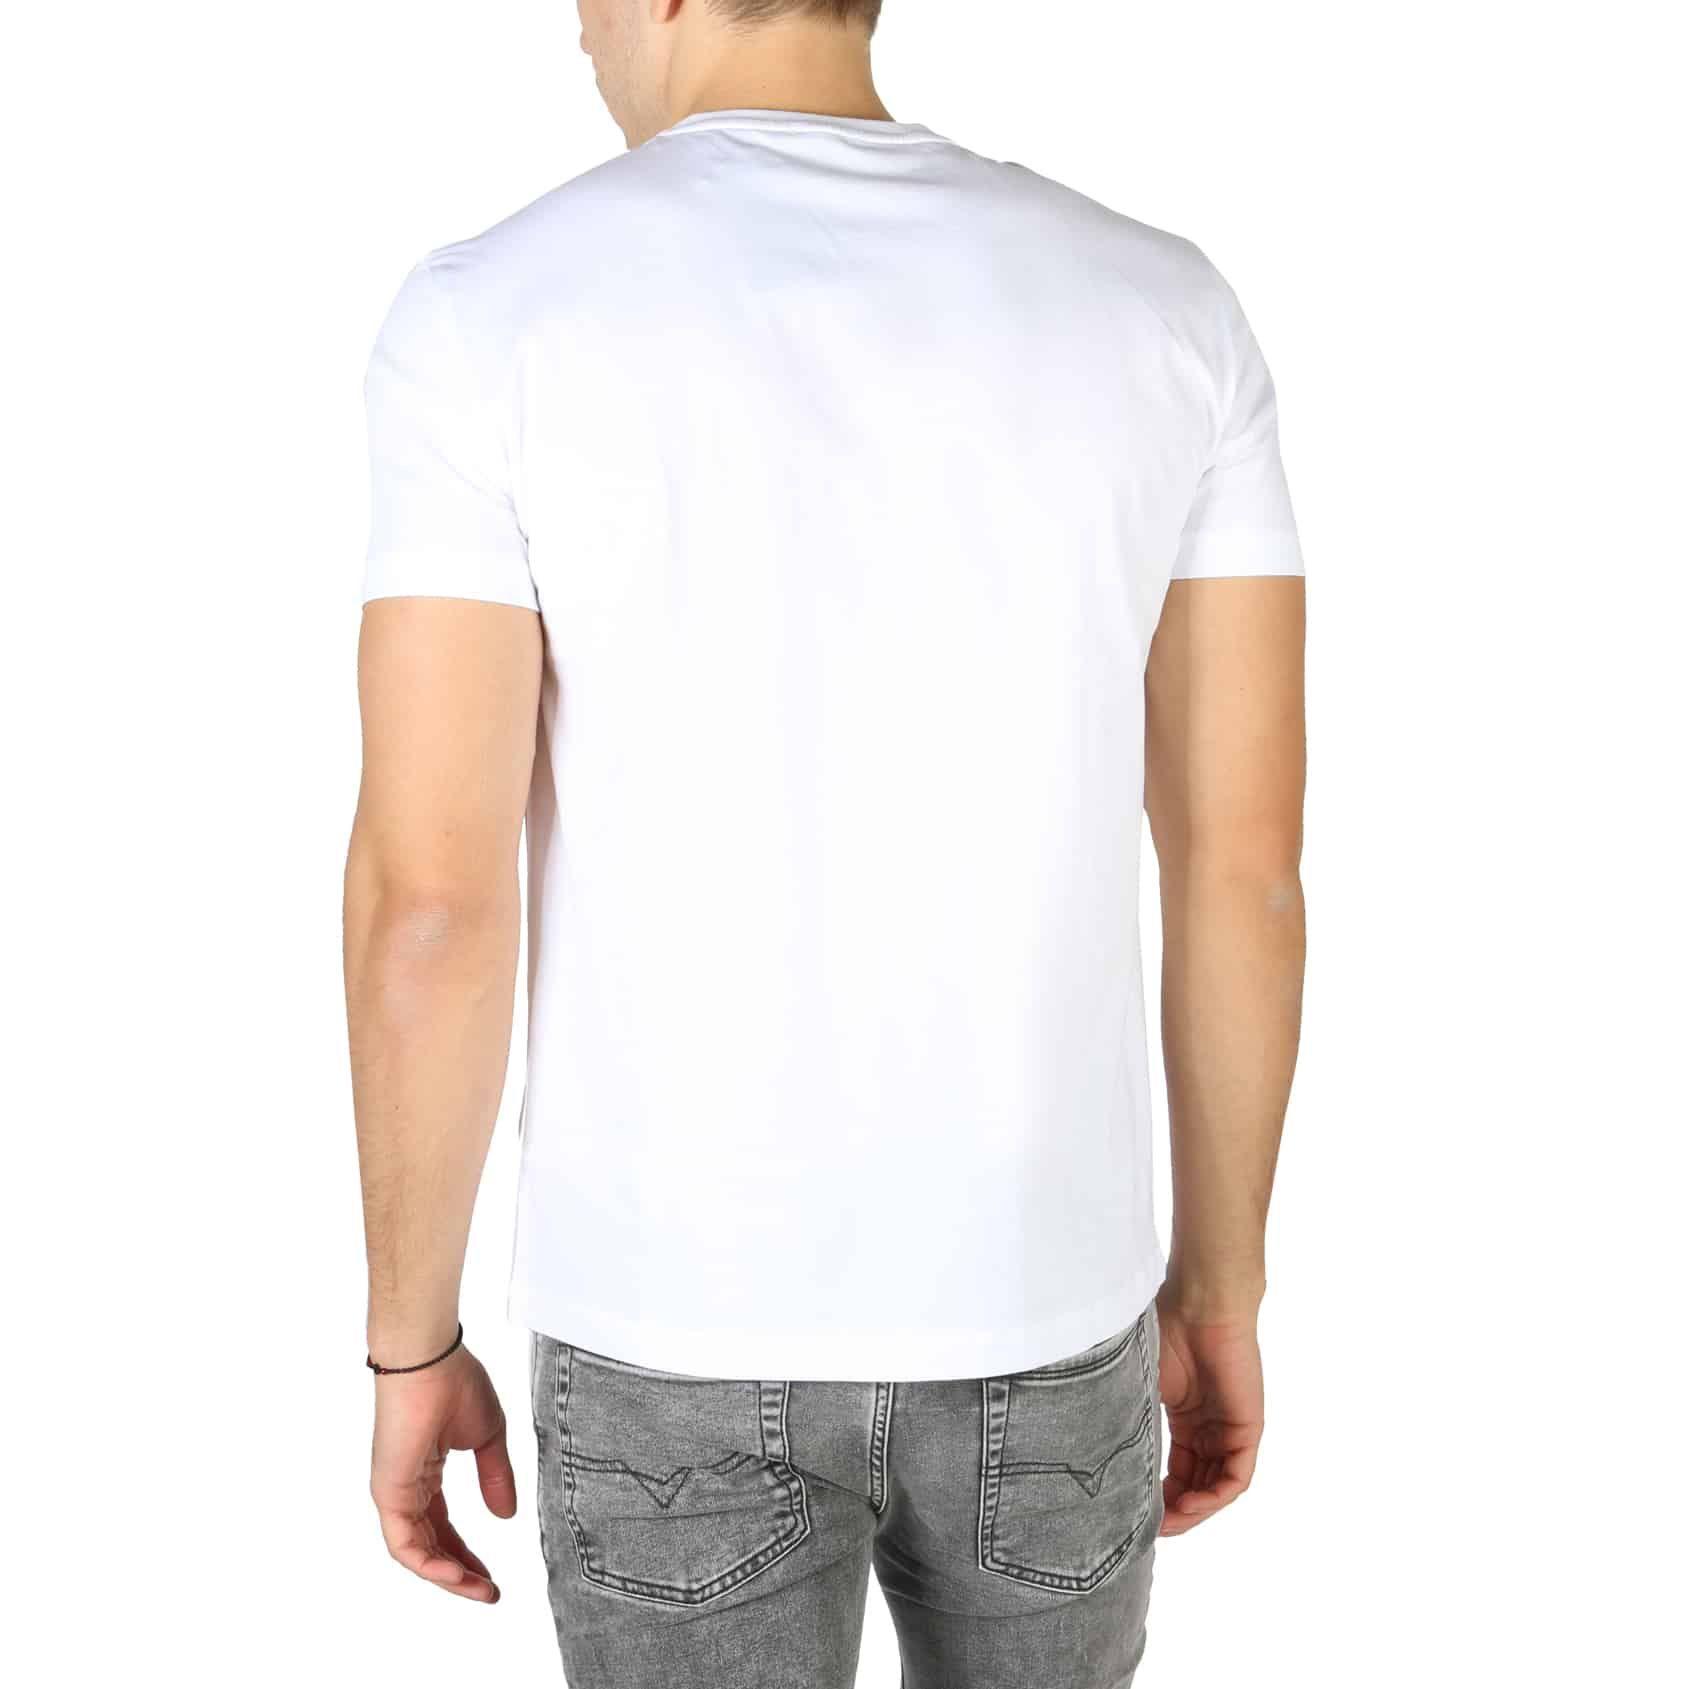 EA7 – 3HPT06 T-shirt